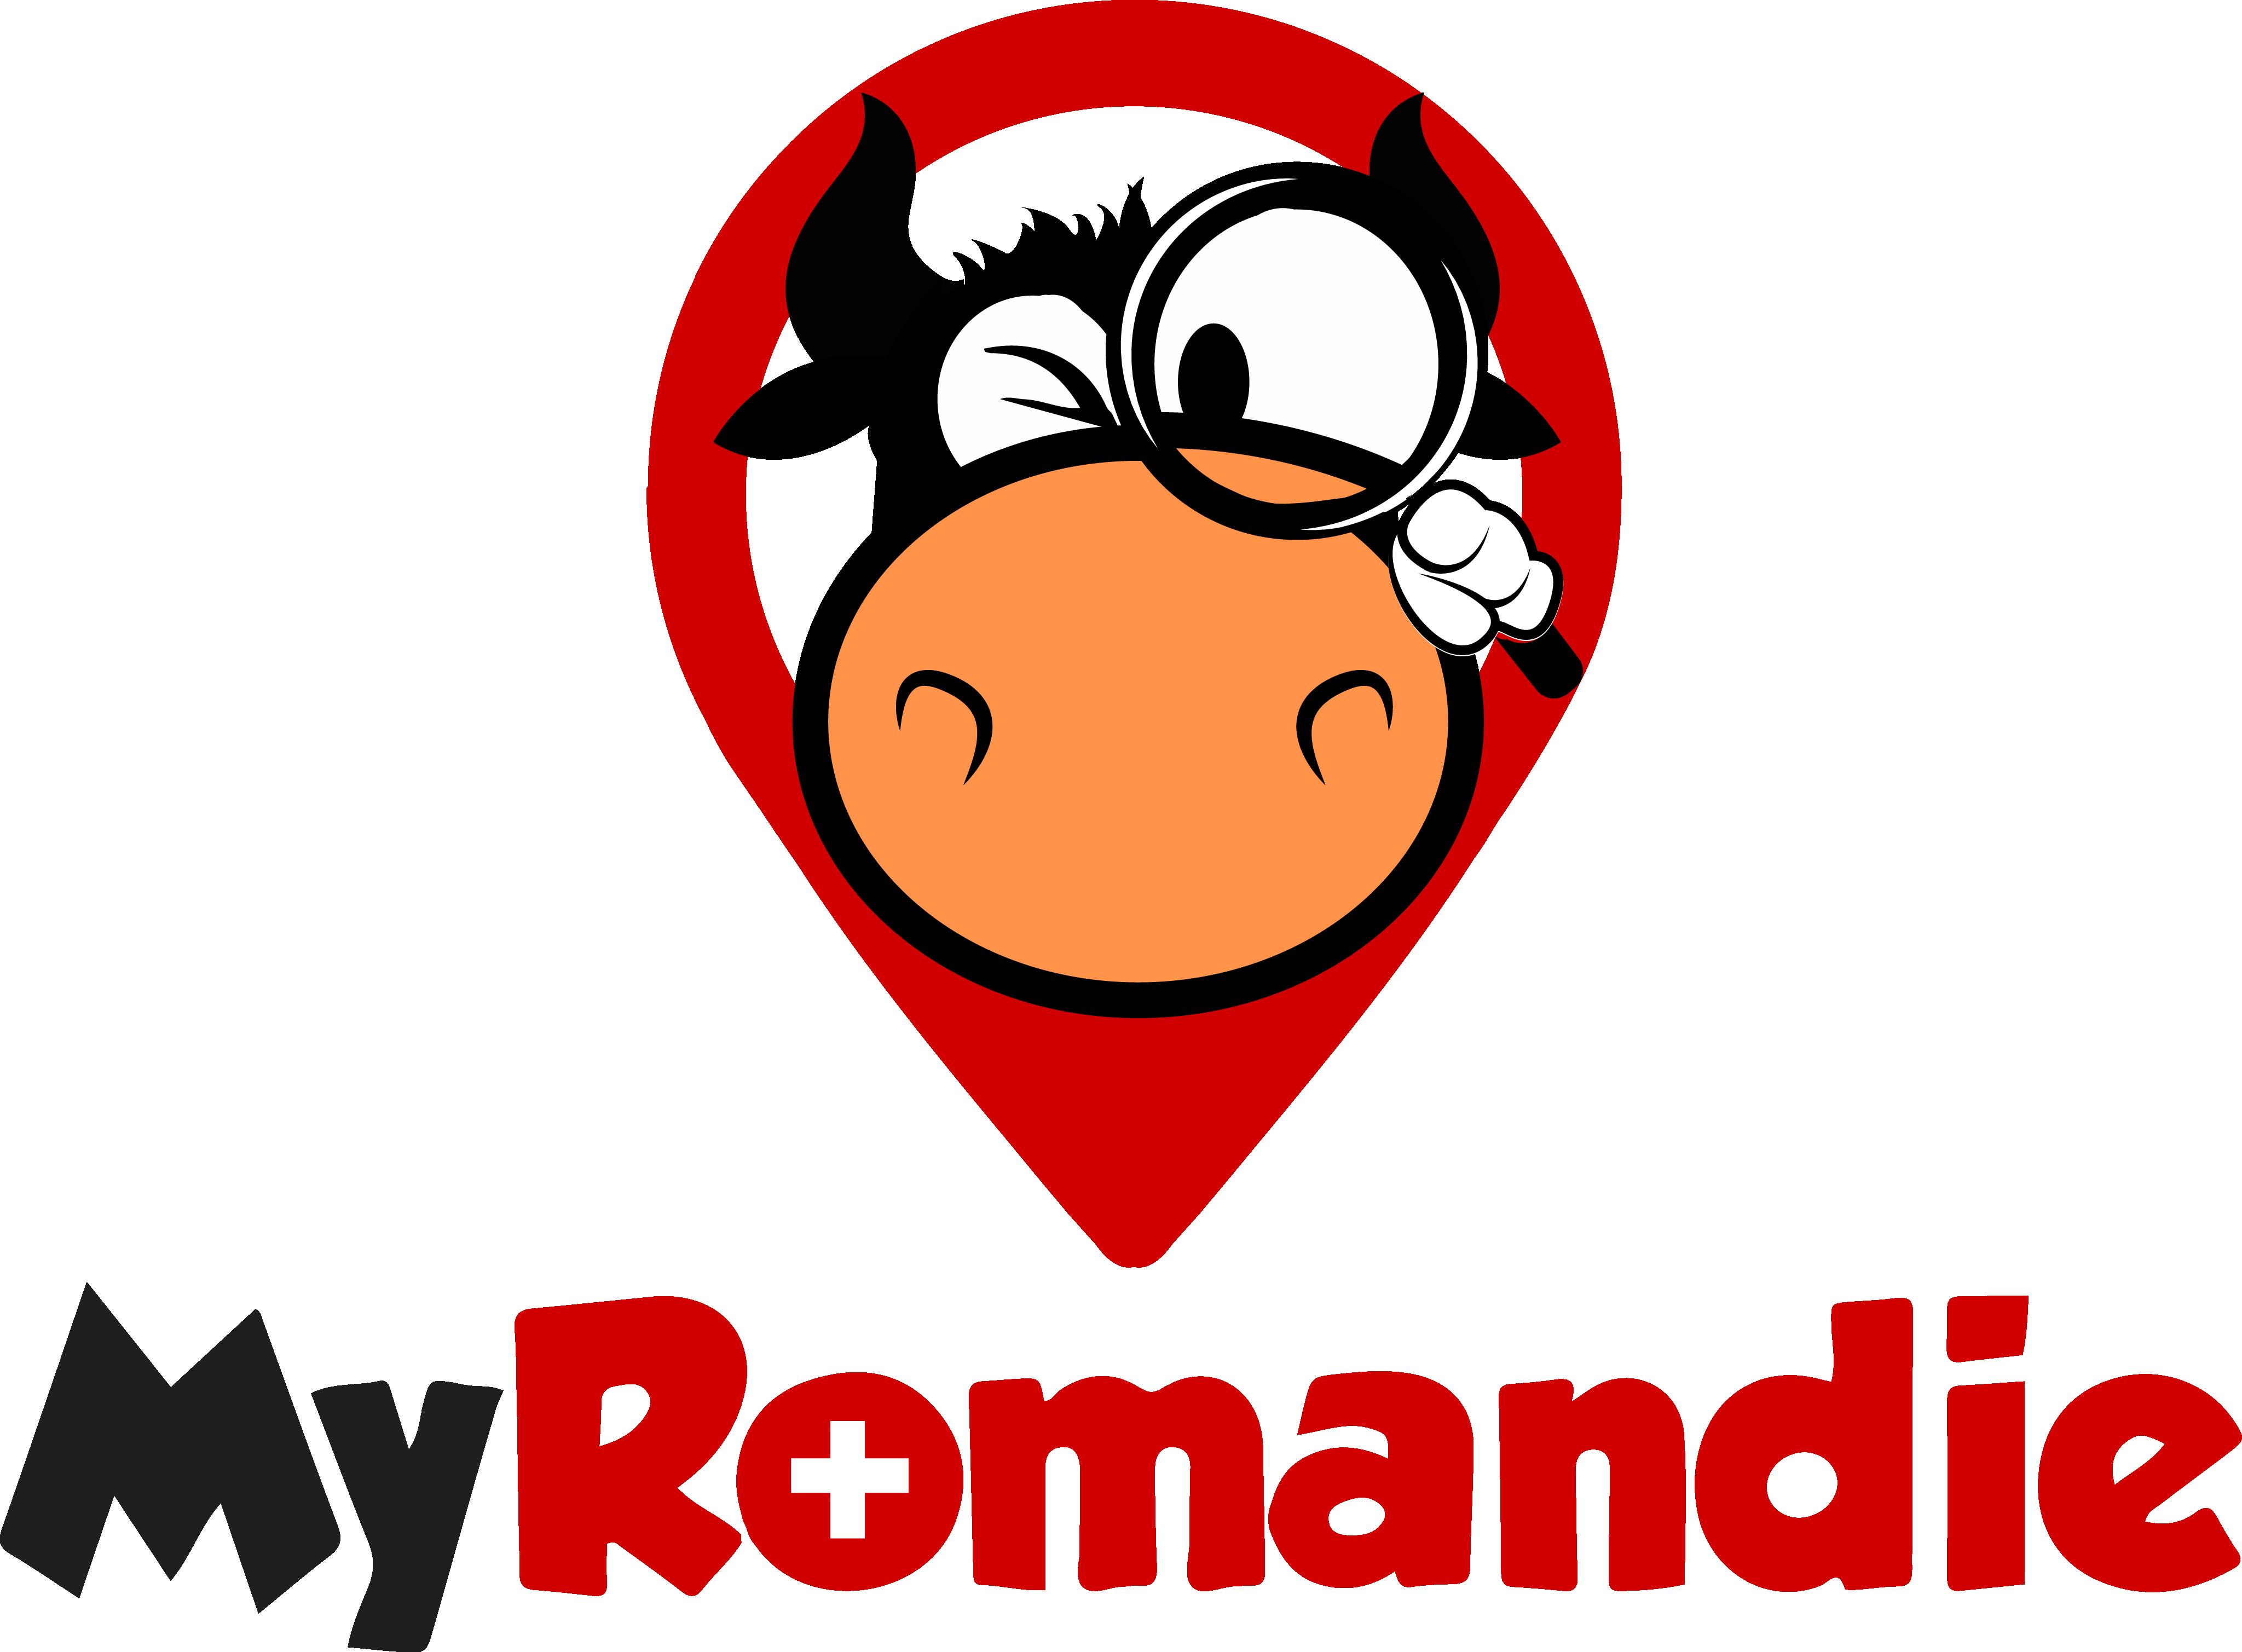 Design a logo with a funny cow for MyRomandie